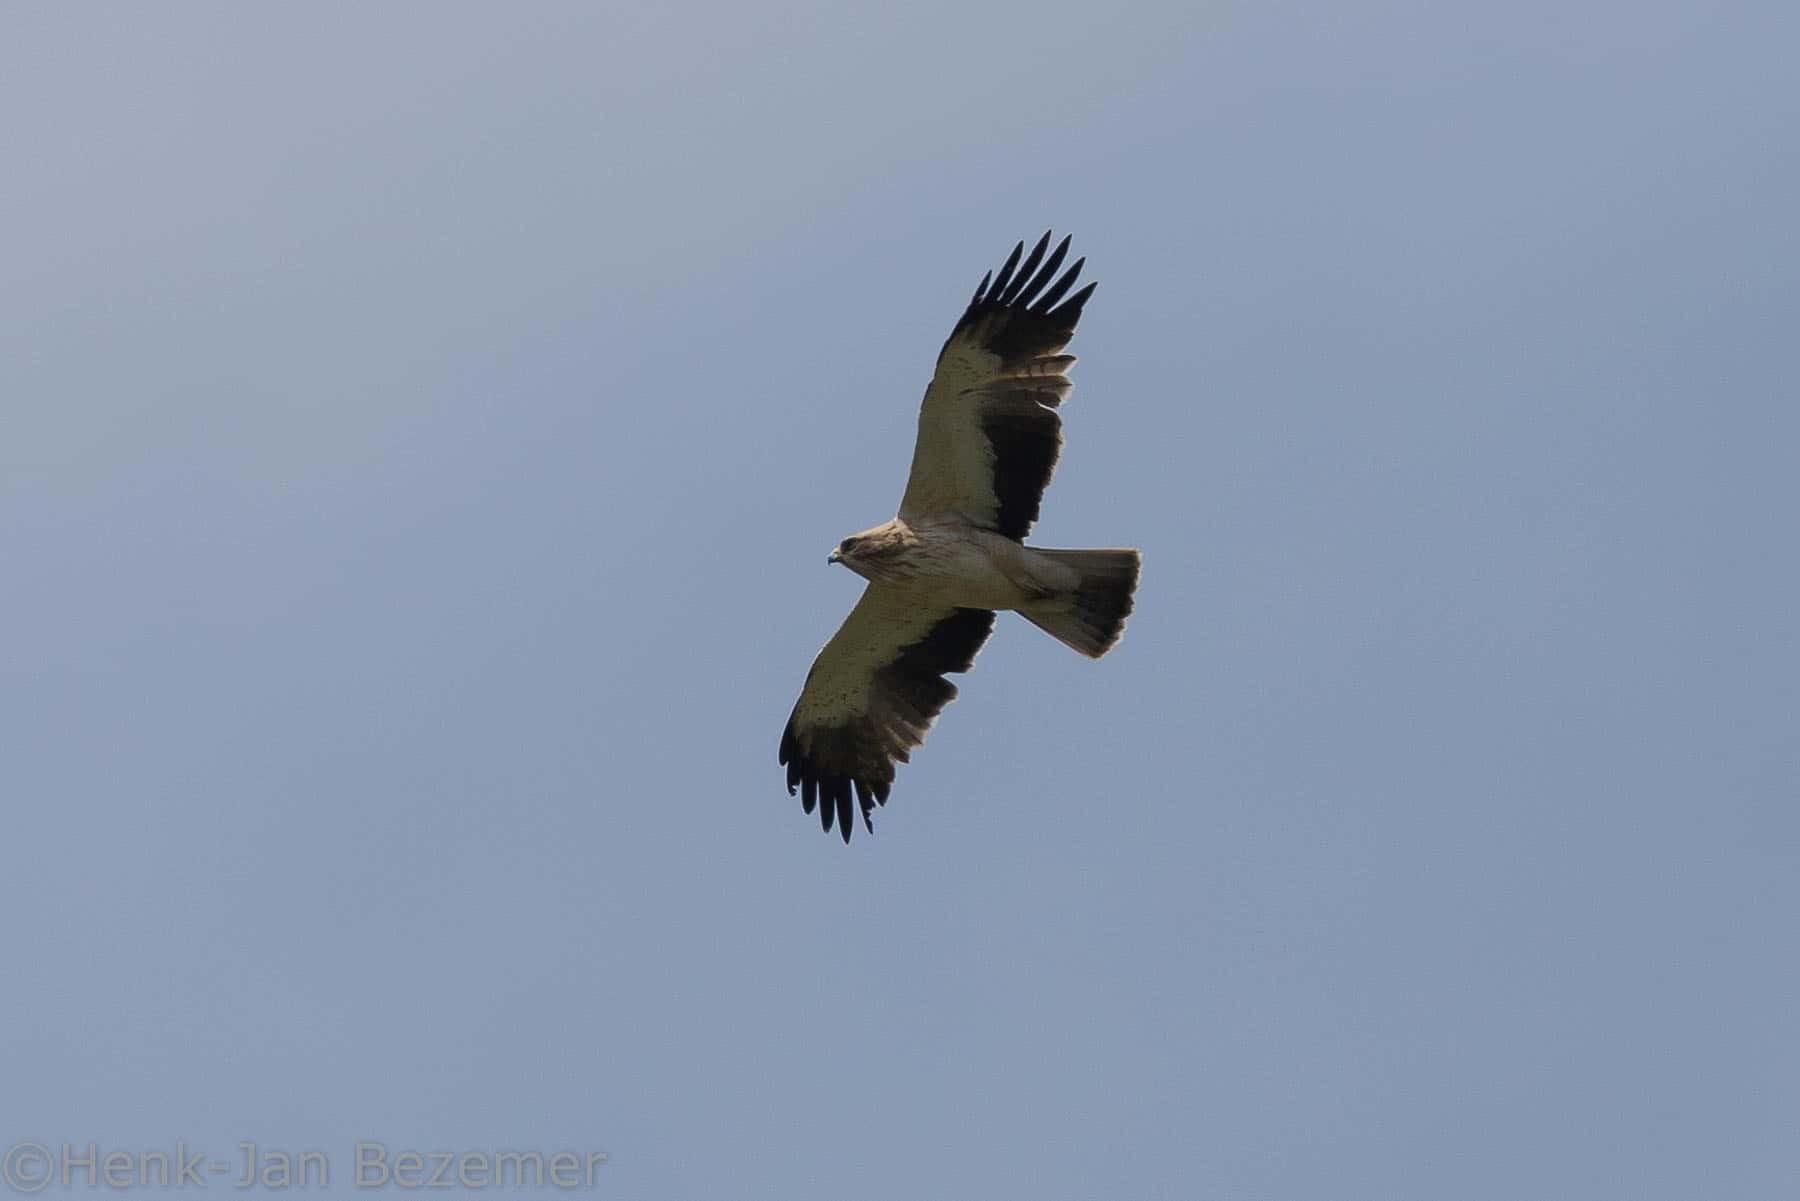 Dwergarend (Aquila pennata)